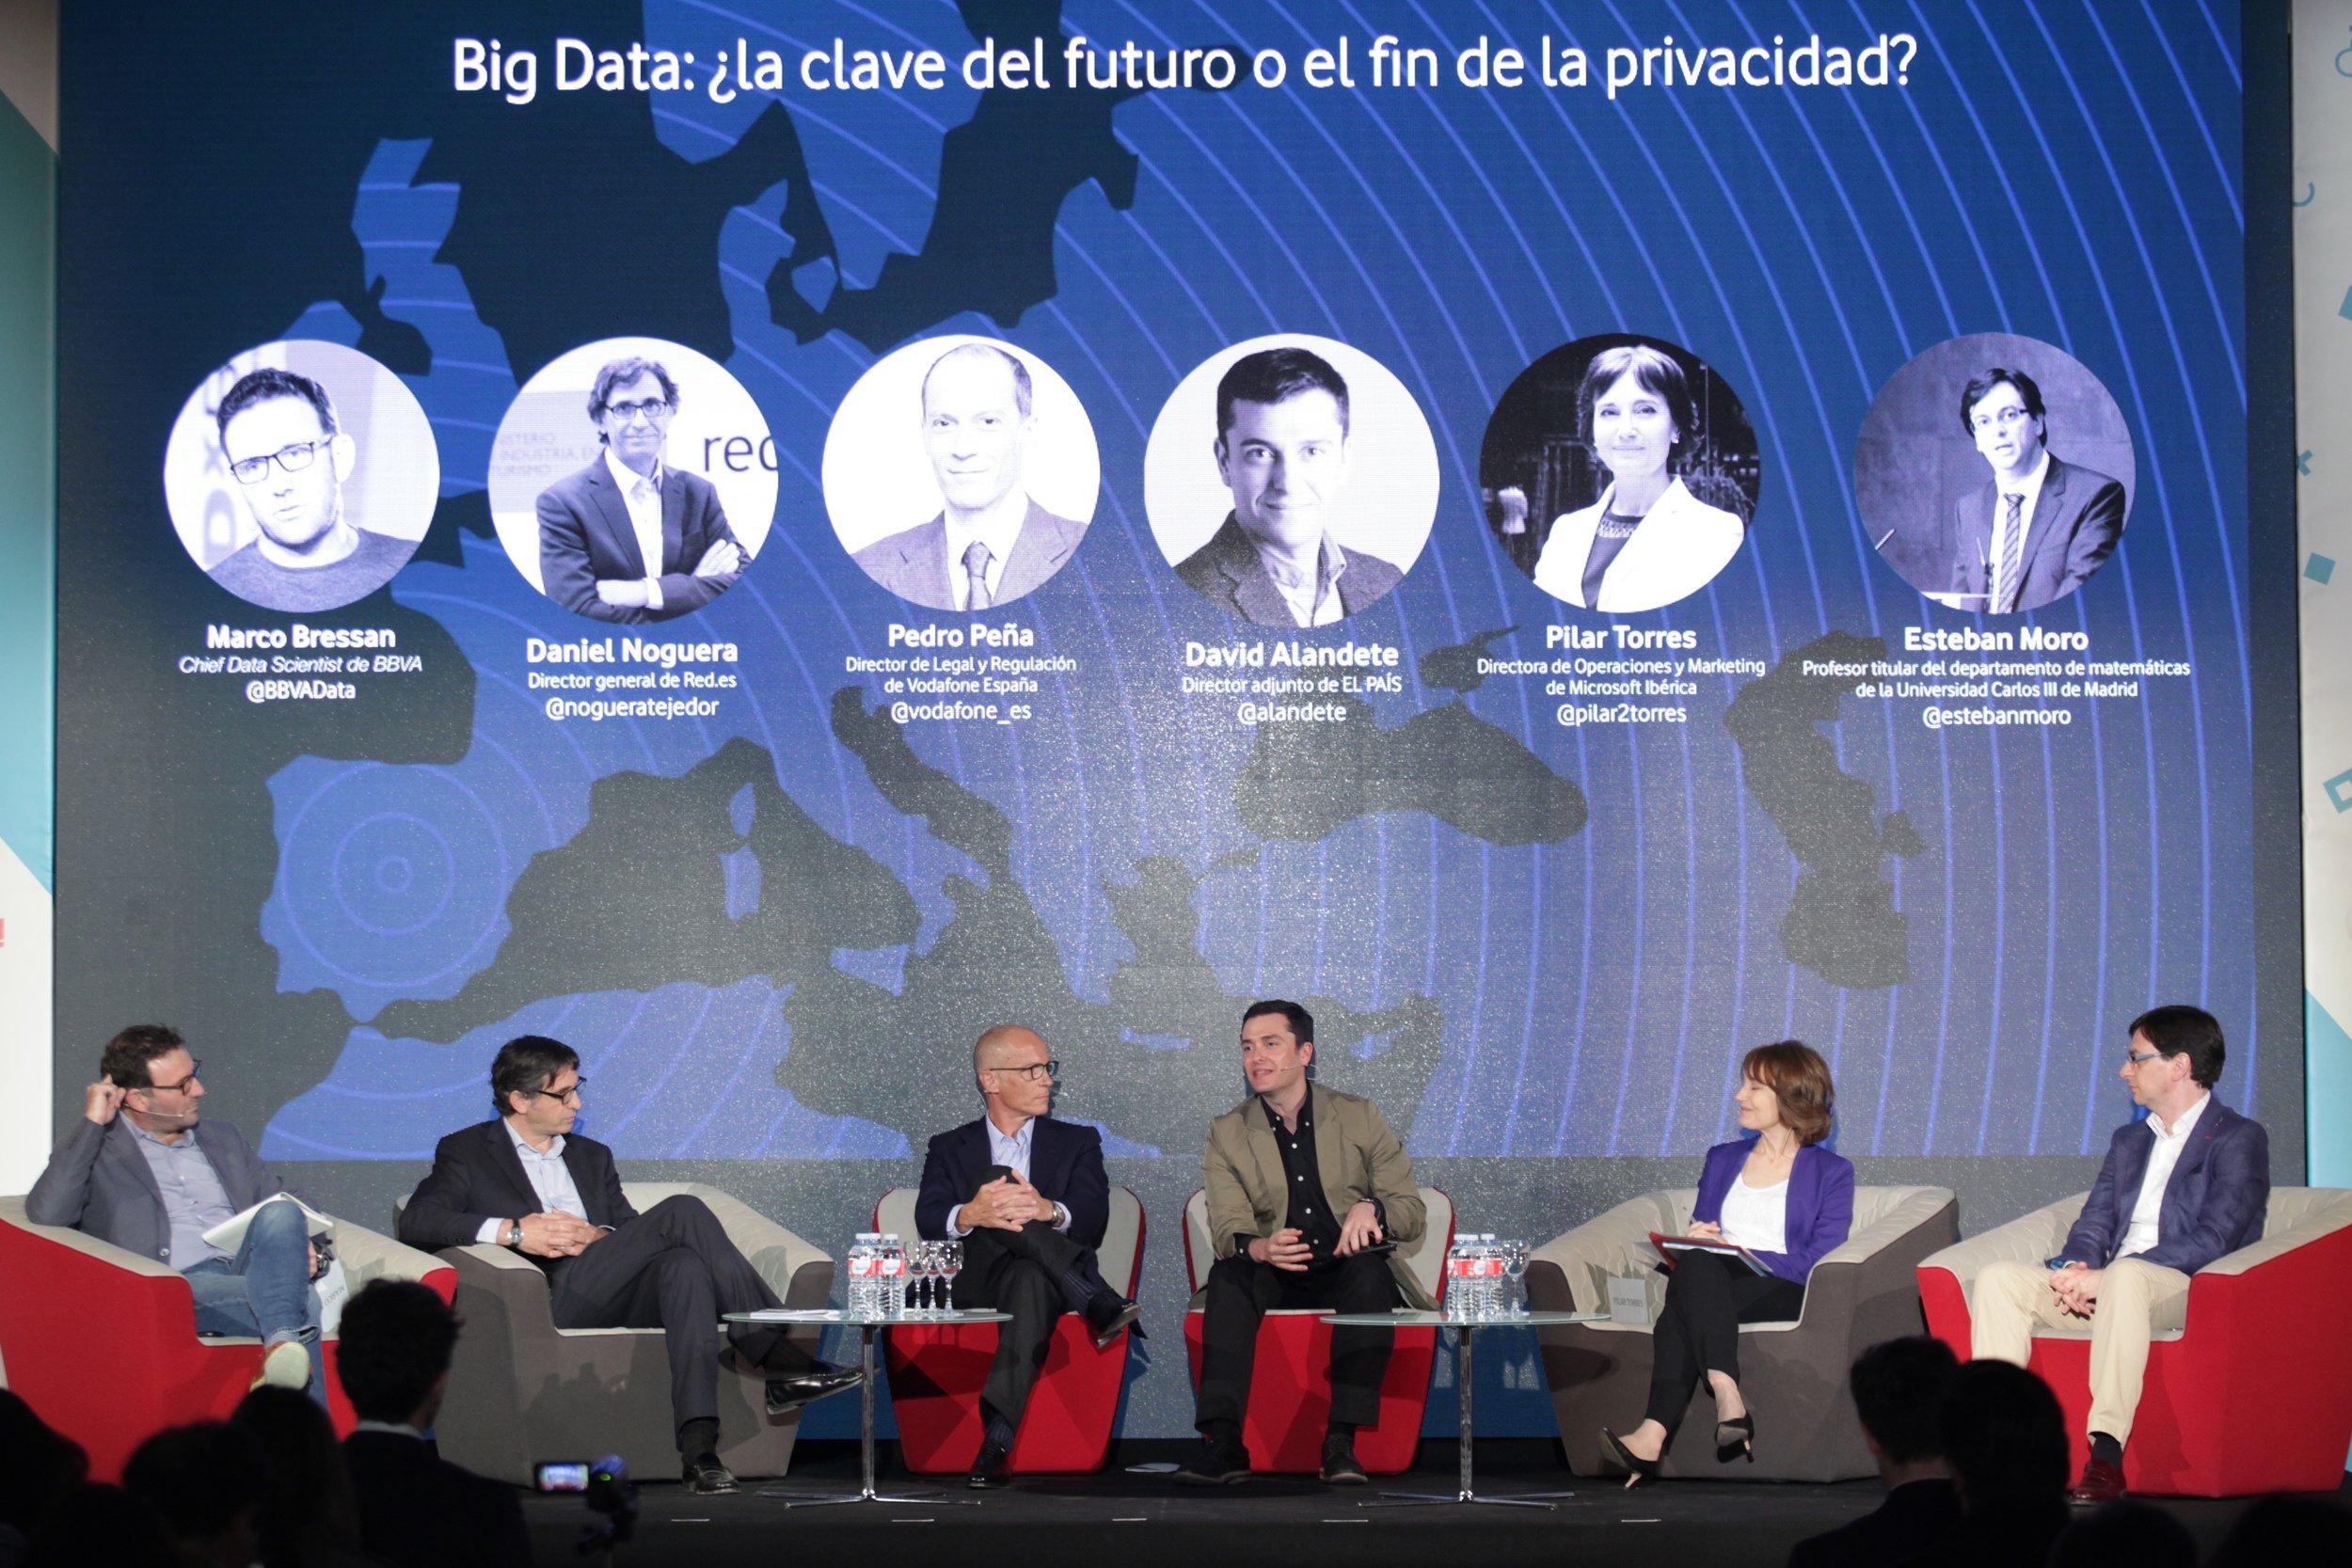 David Alandete moderating a big data and privacy debate in Madrid, 2016.